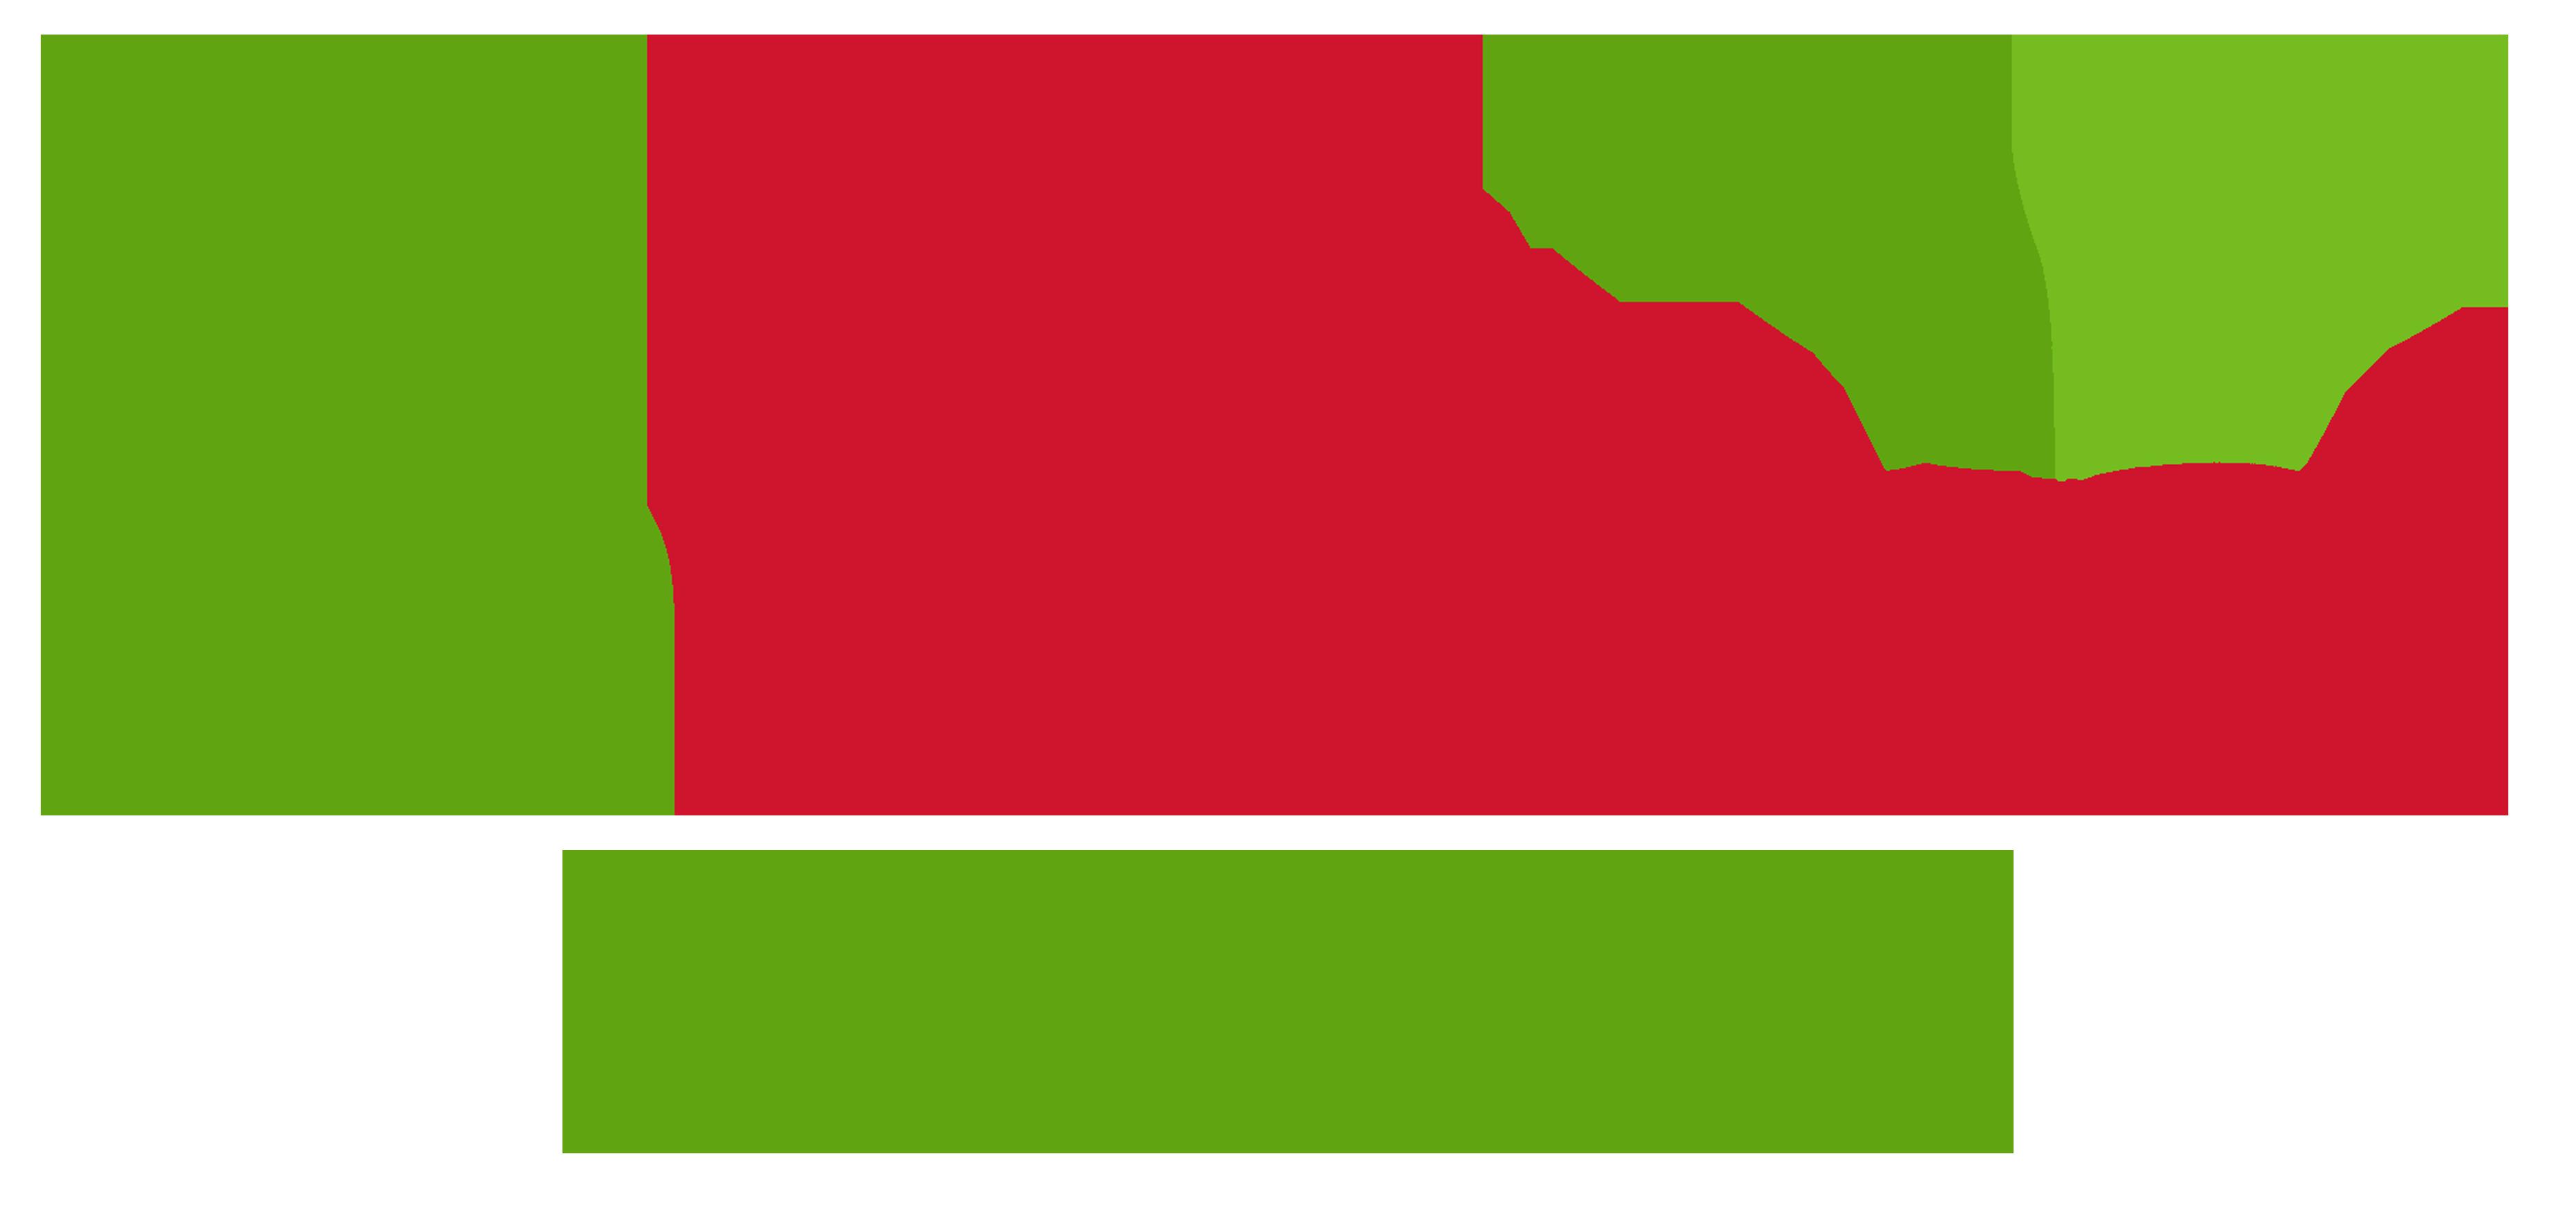 Enmarket Arena